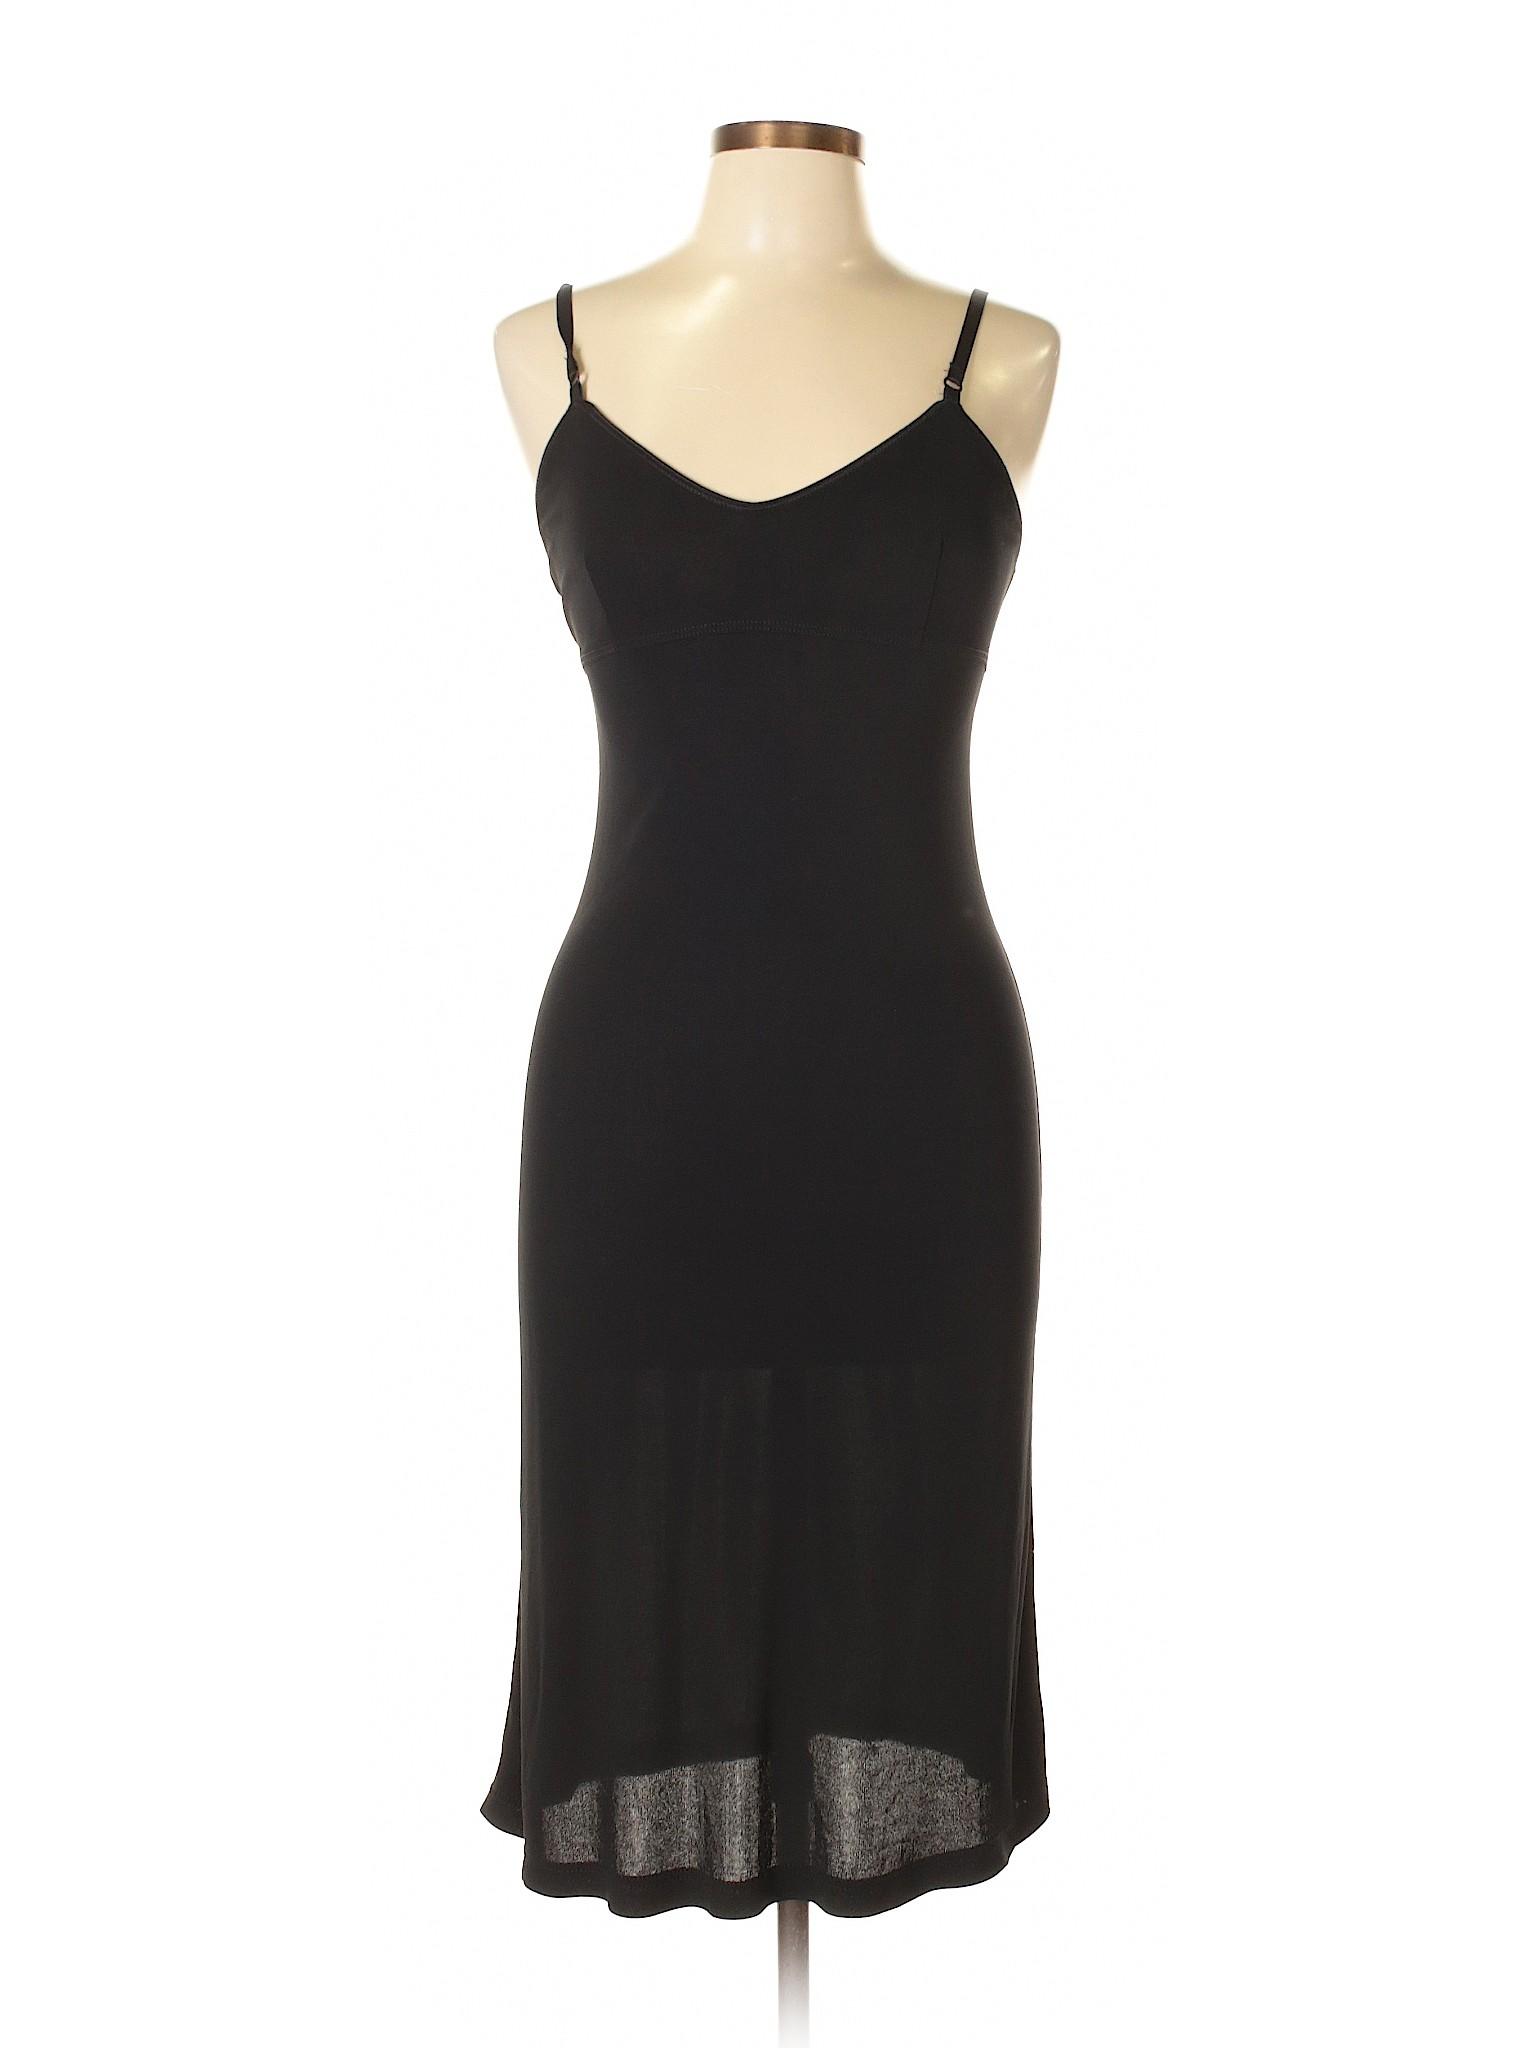 Cocktail Edition Dress Boutique winter Limited qxtYPtUg